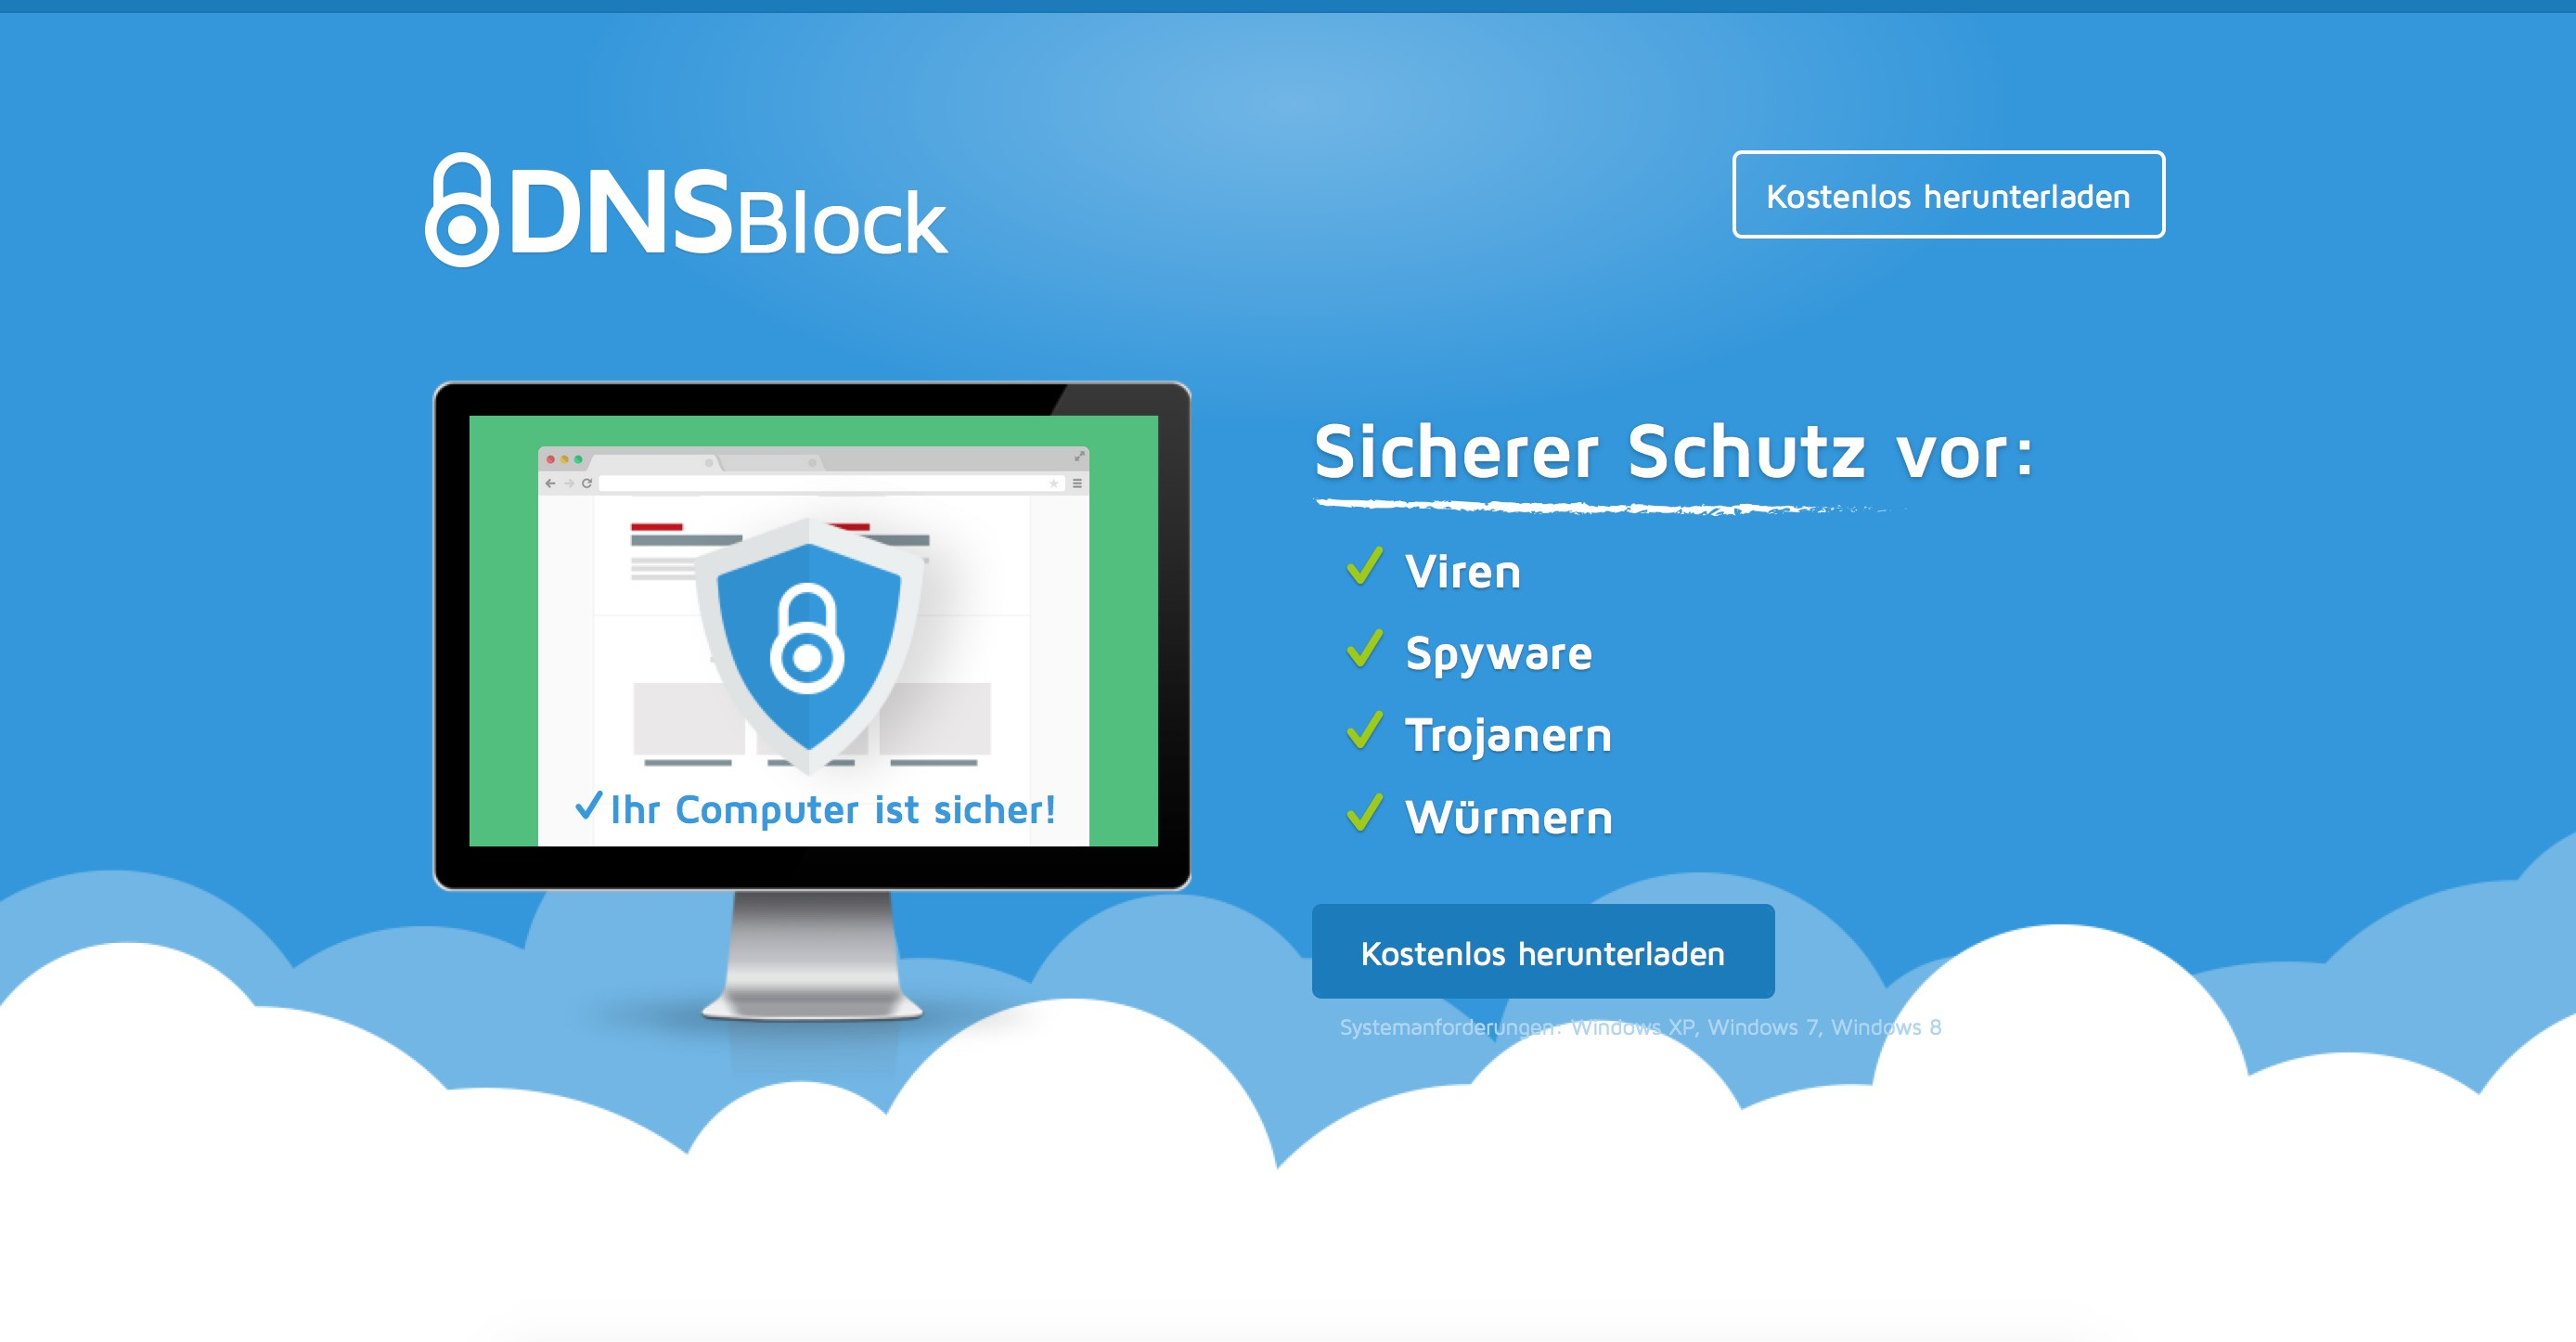 DNSBlock